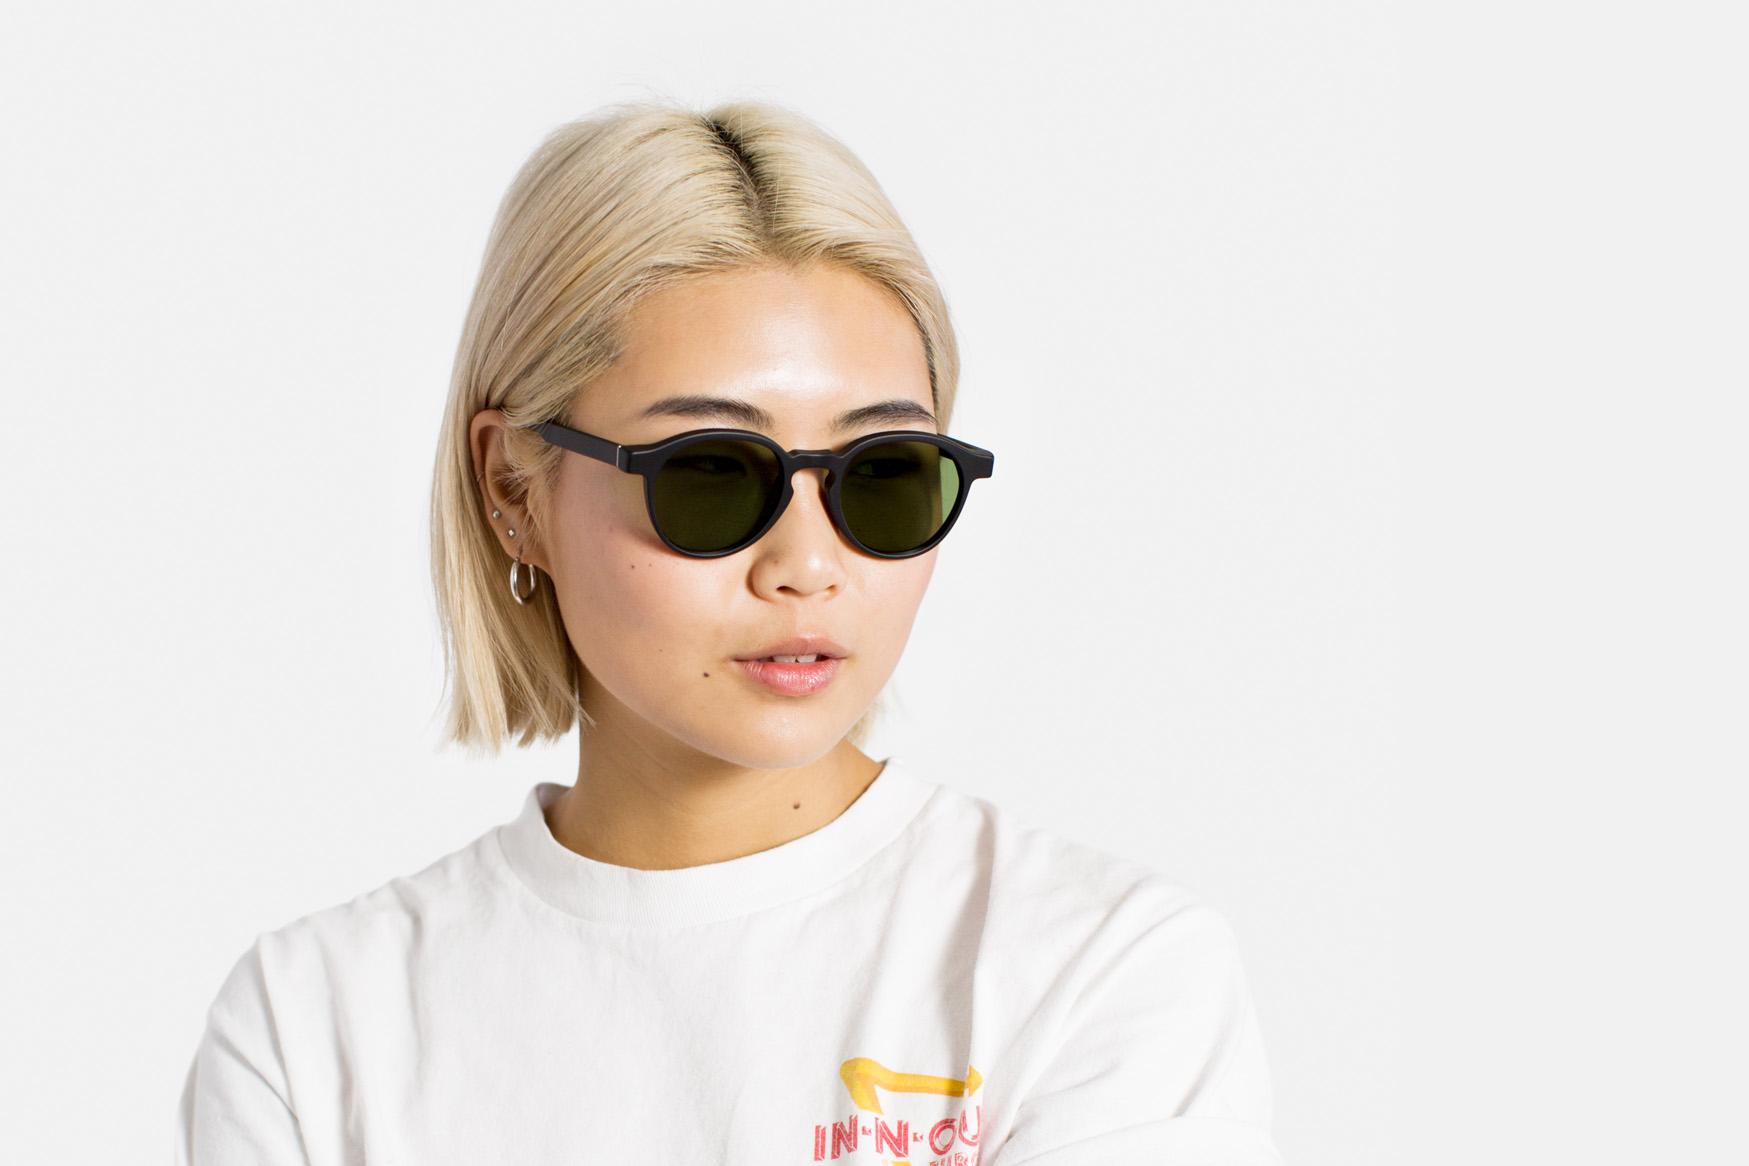 retrosuperfuture-andy-warhol-iconic-series-ss16-eyewear-2